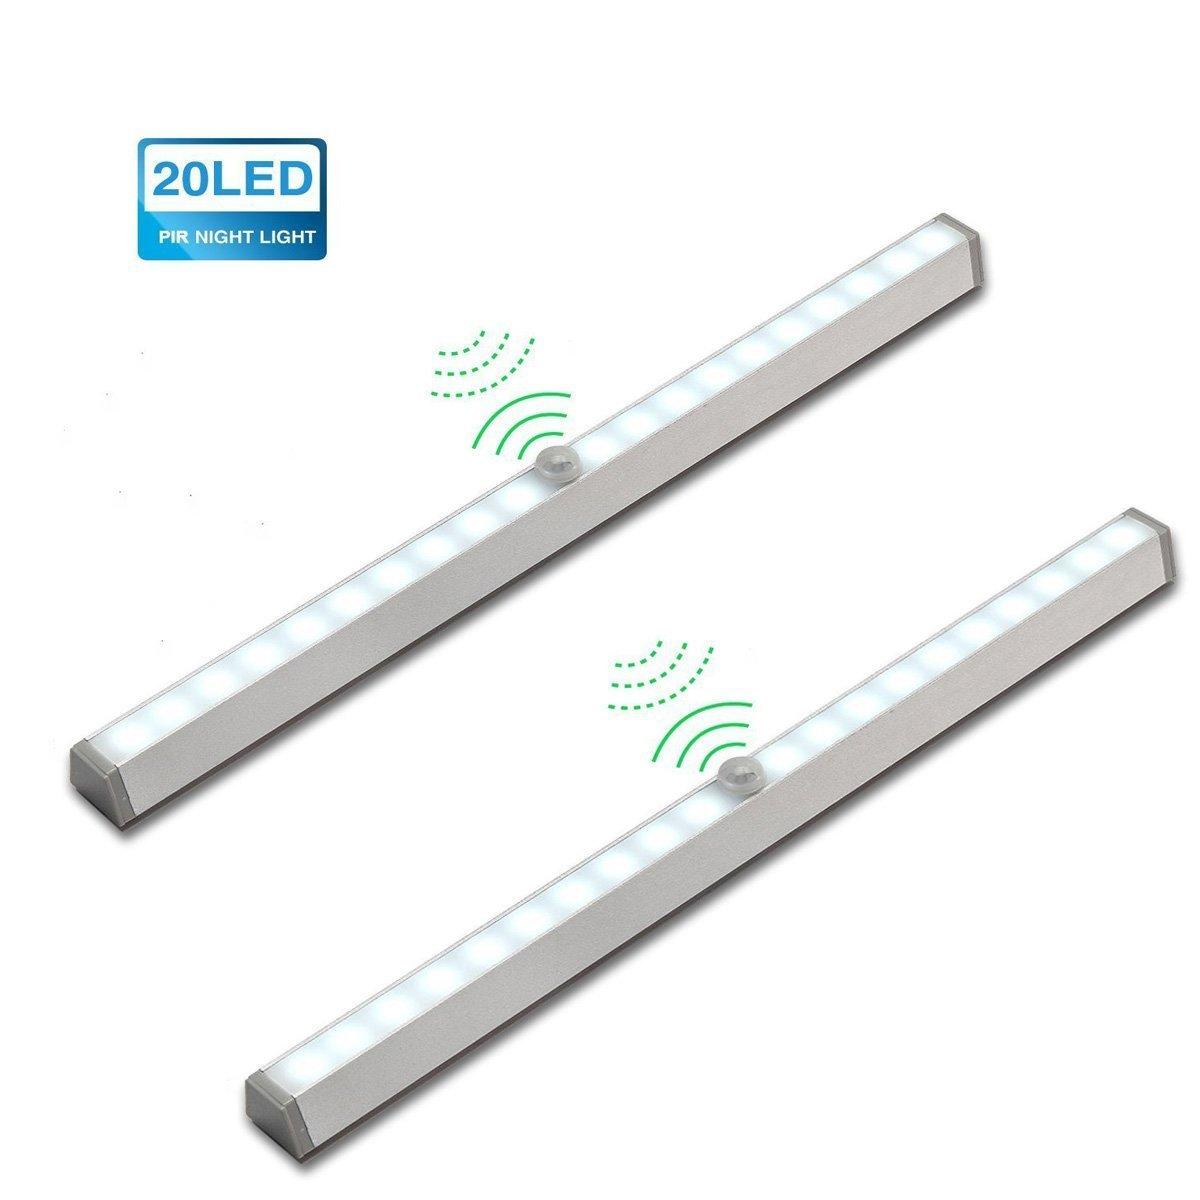 KINGSO 2x 20 LED automatische Beleuchtung Sensor Licht Kabellose ...